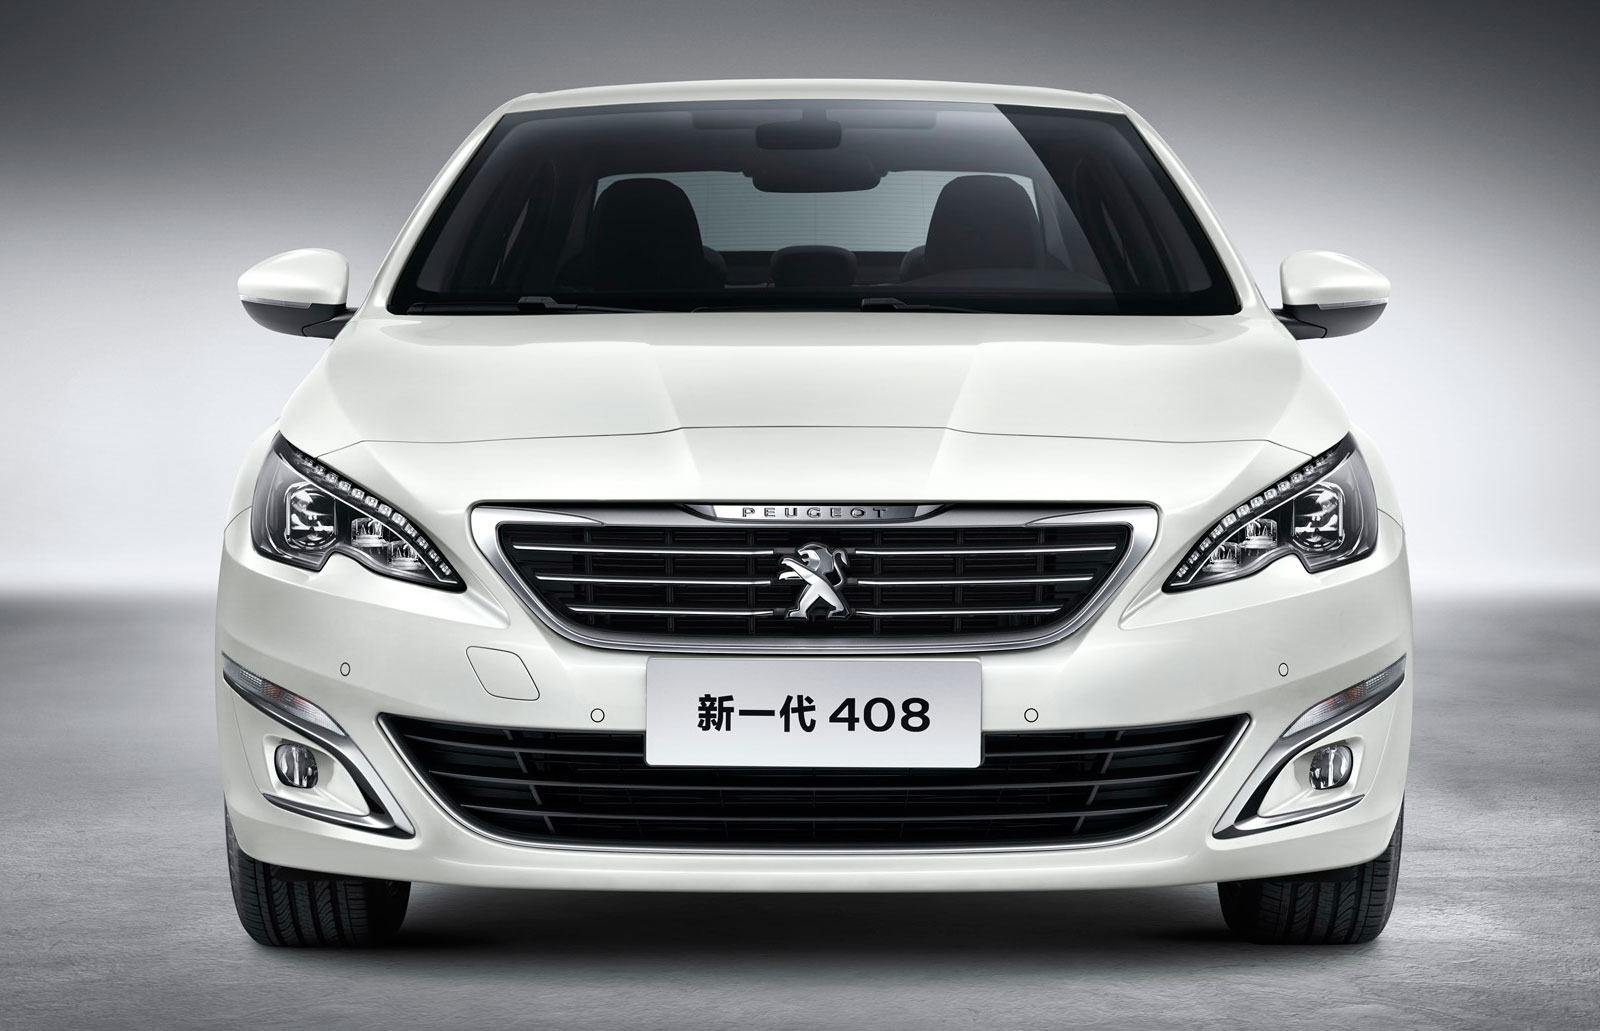 New Peugeot 408 Sedan Unveiled At Auto China 2014